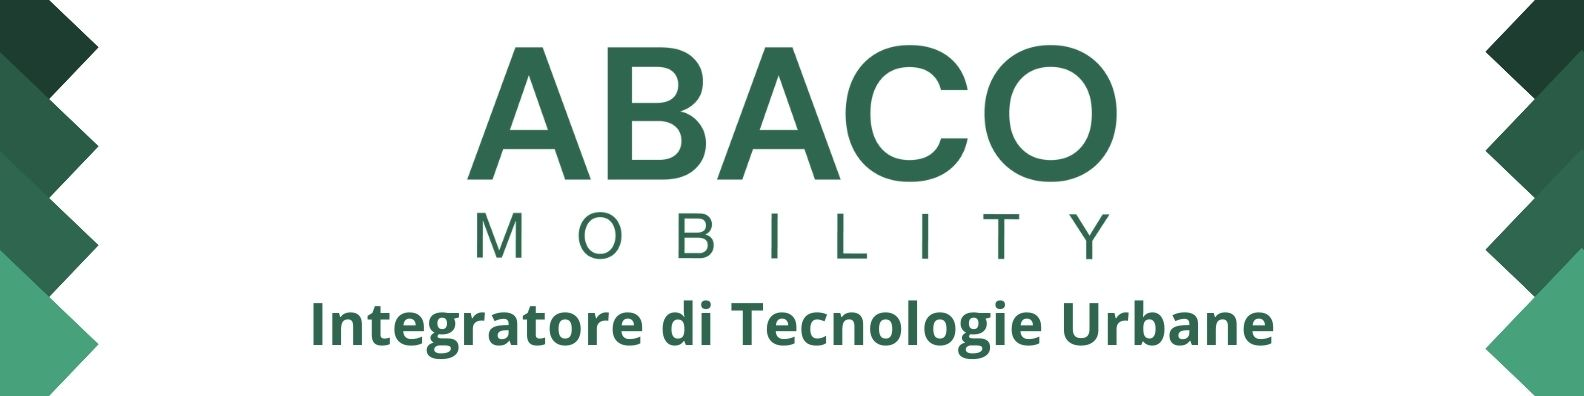 Nuovo logo Abaco Mobility